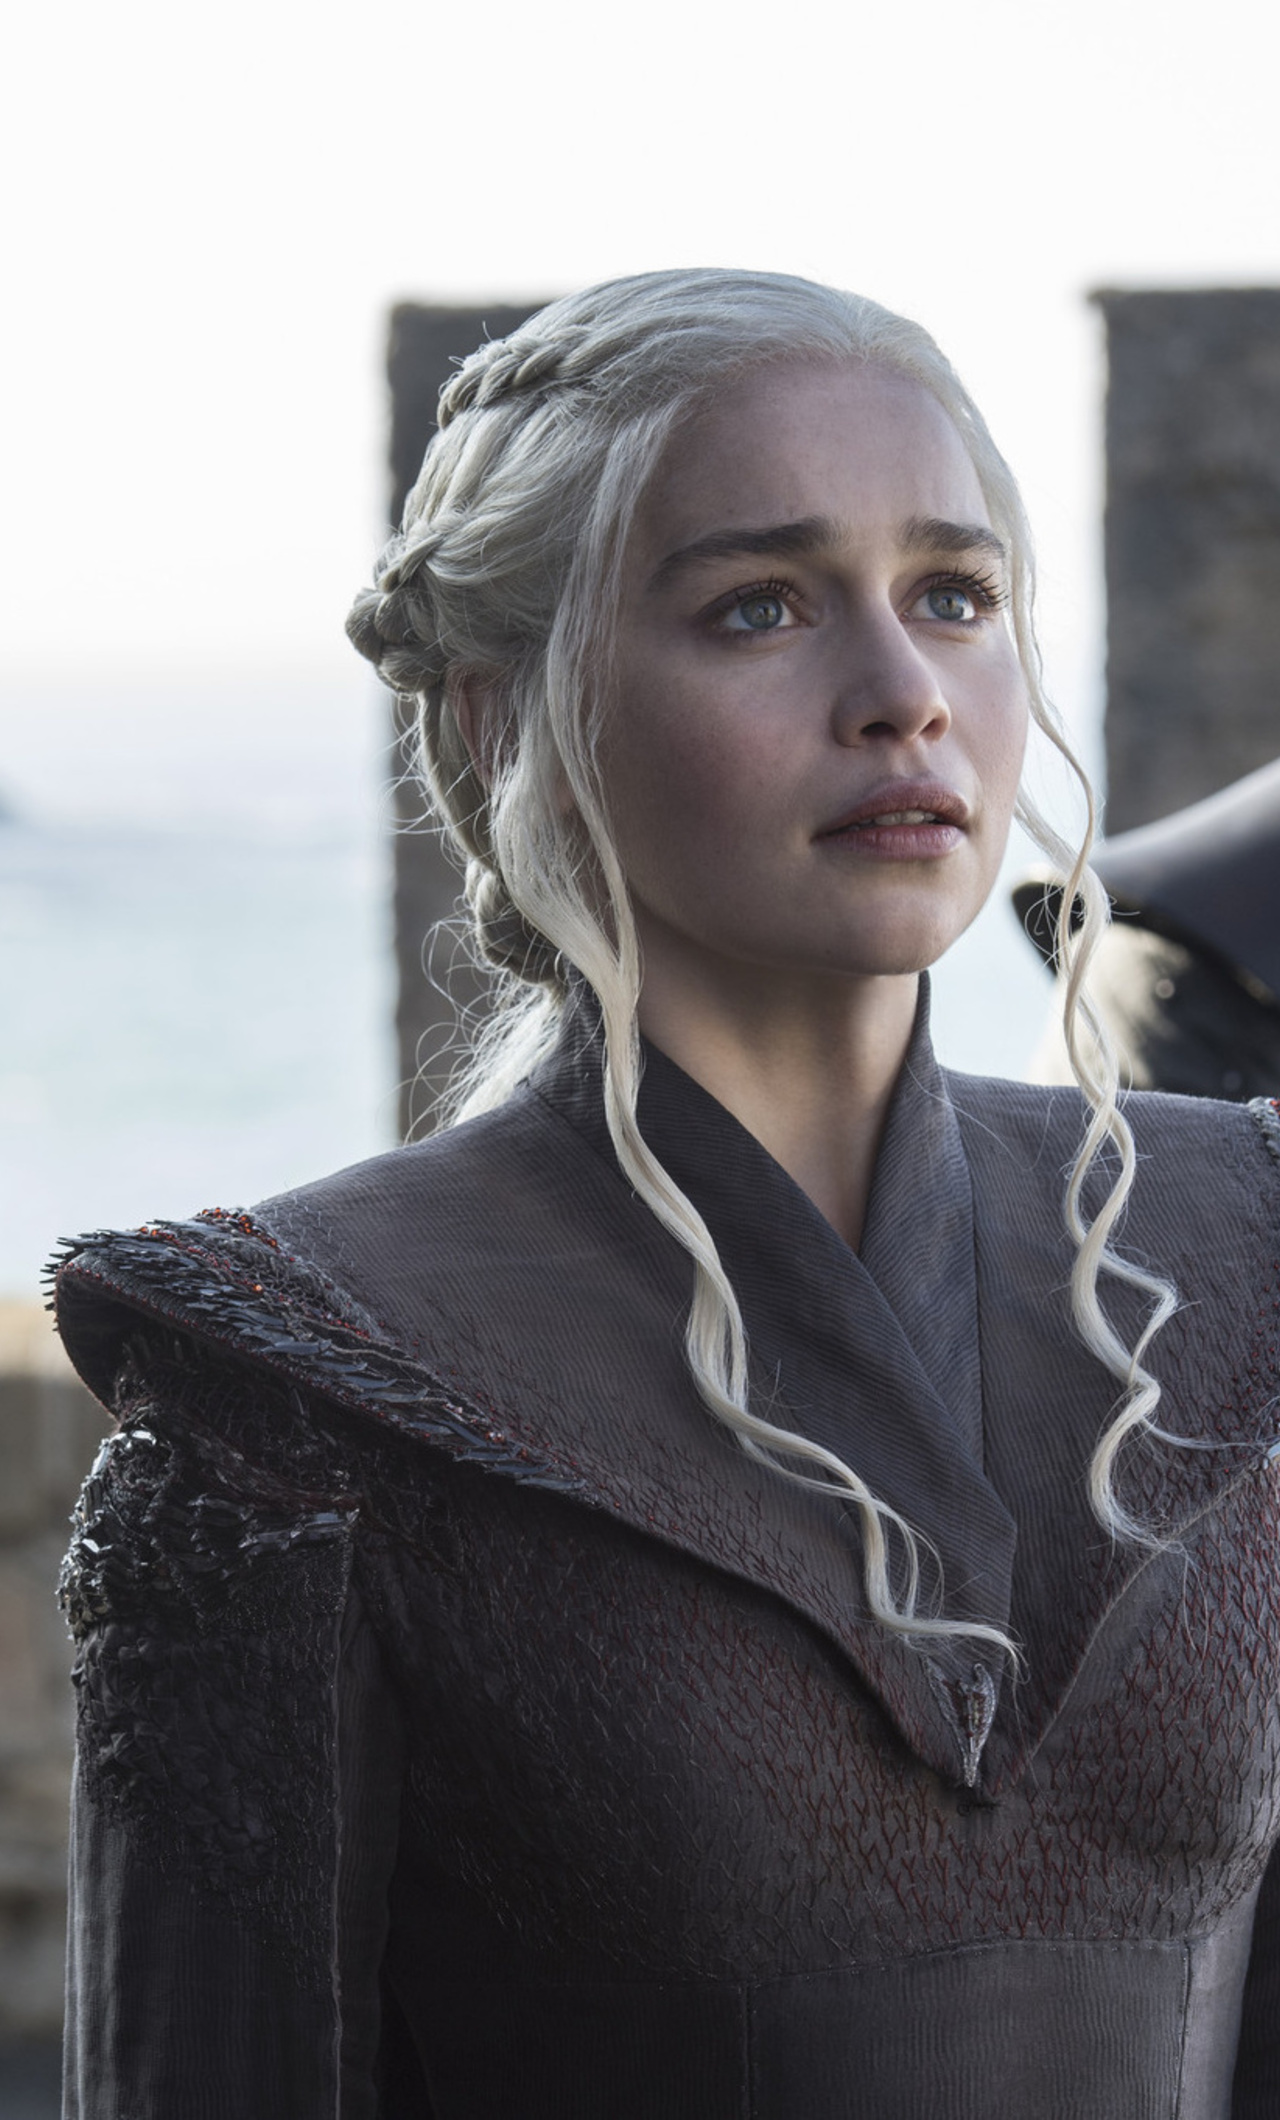 1280x2120 game of thrones season 7 daenerys targaryen for Daenerys jewelry season 7